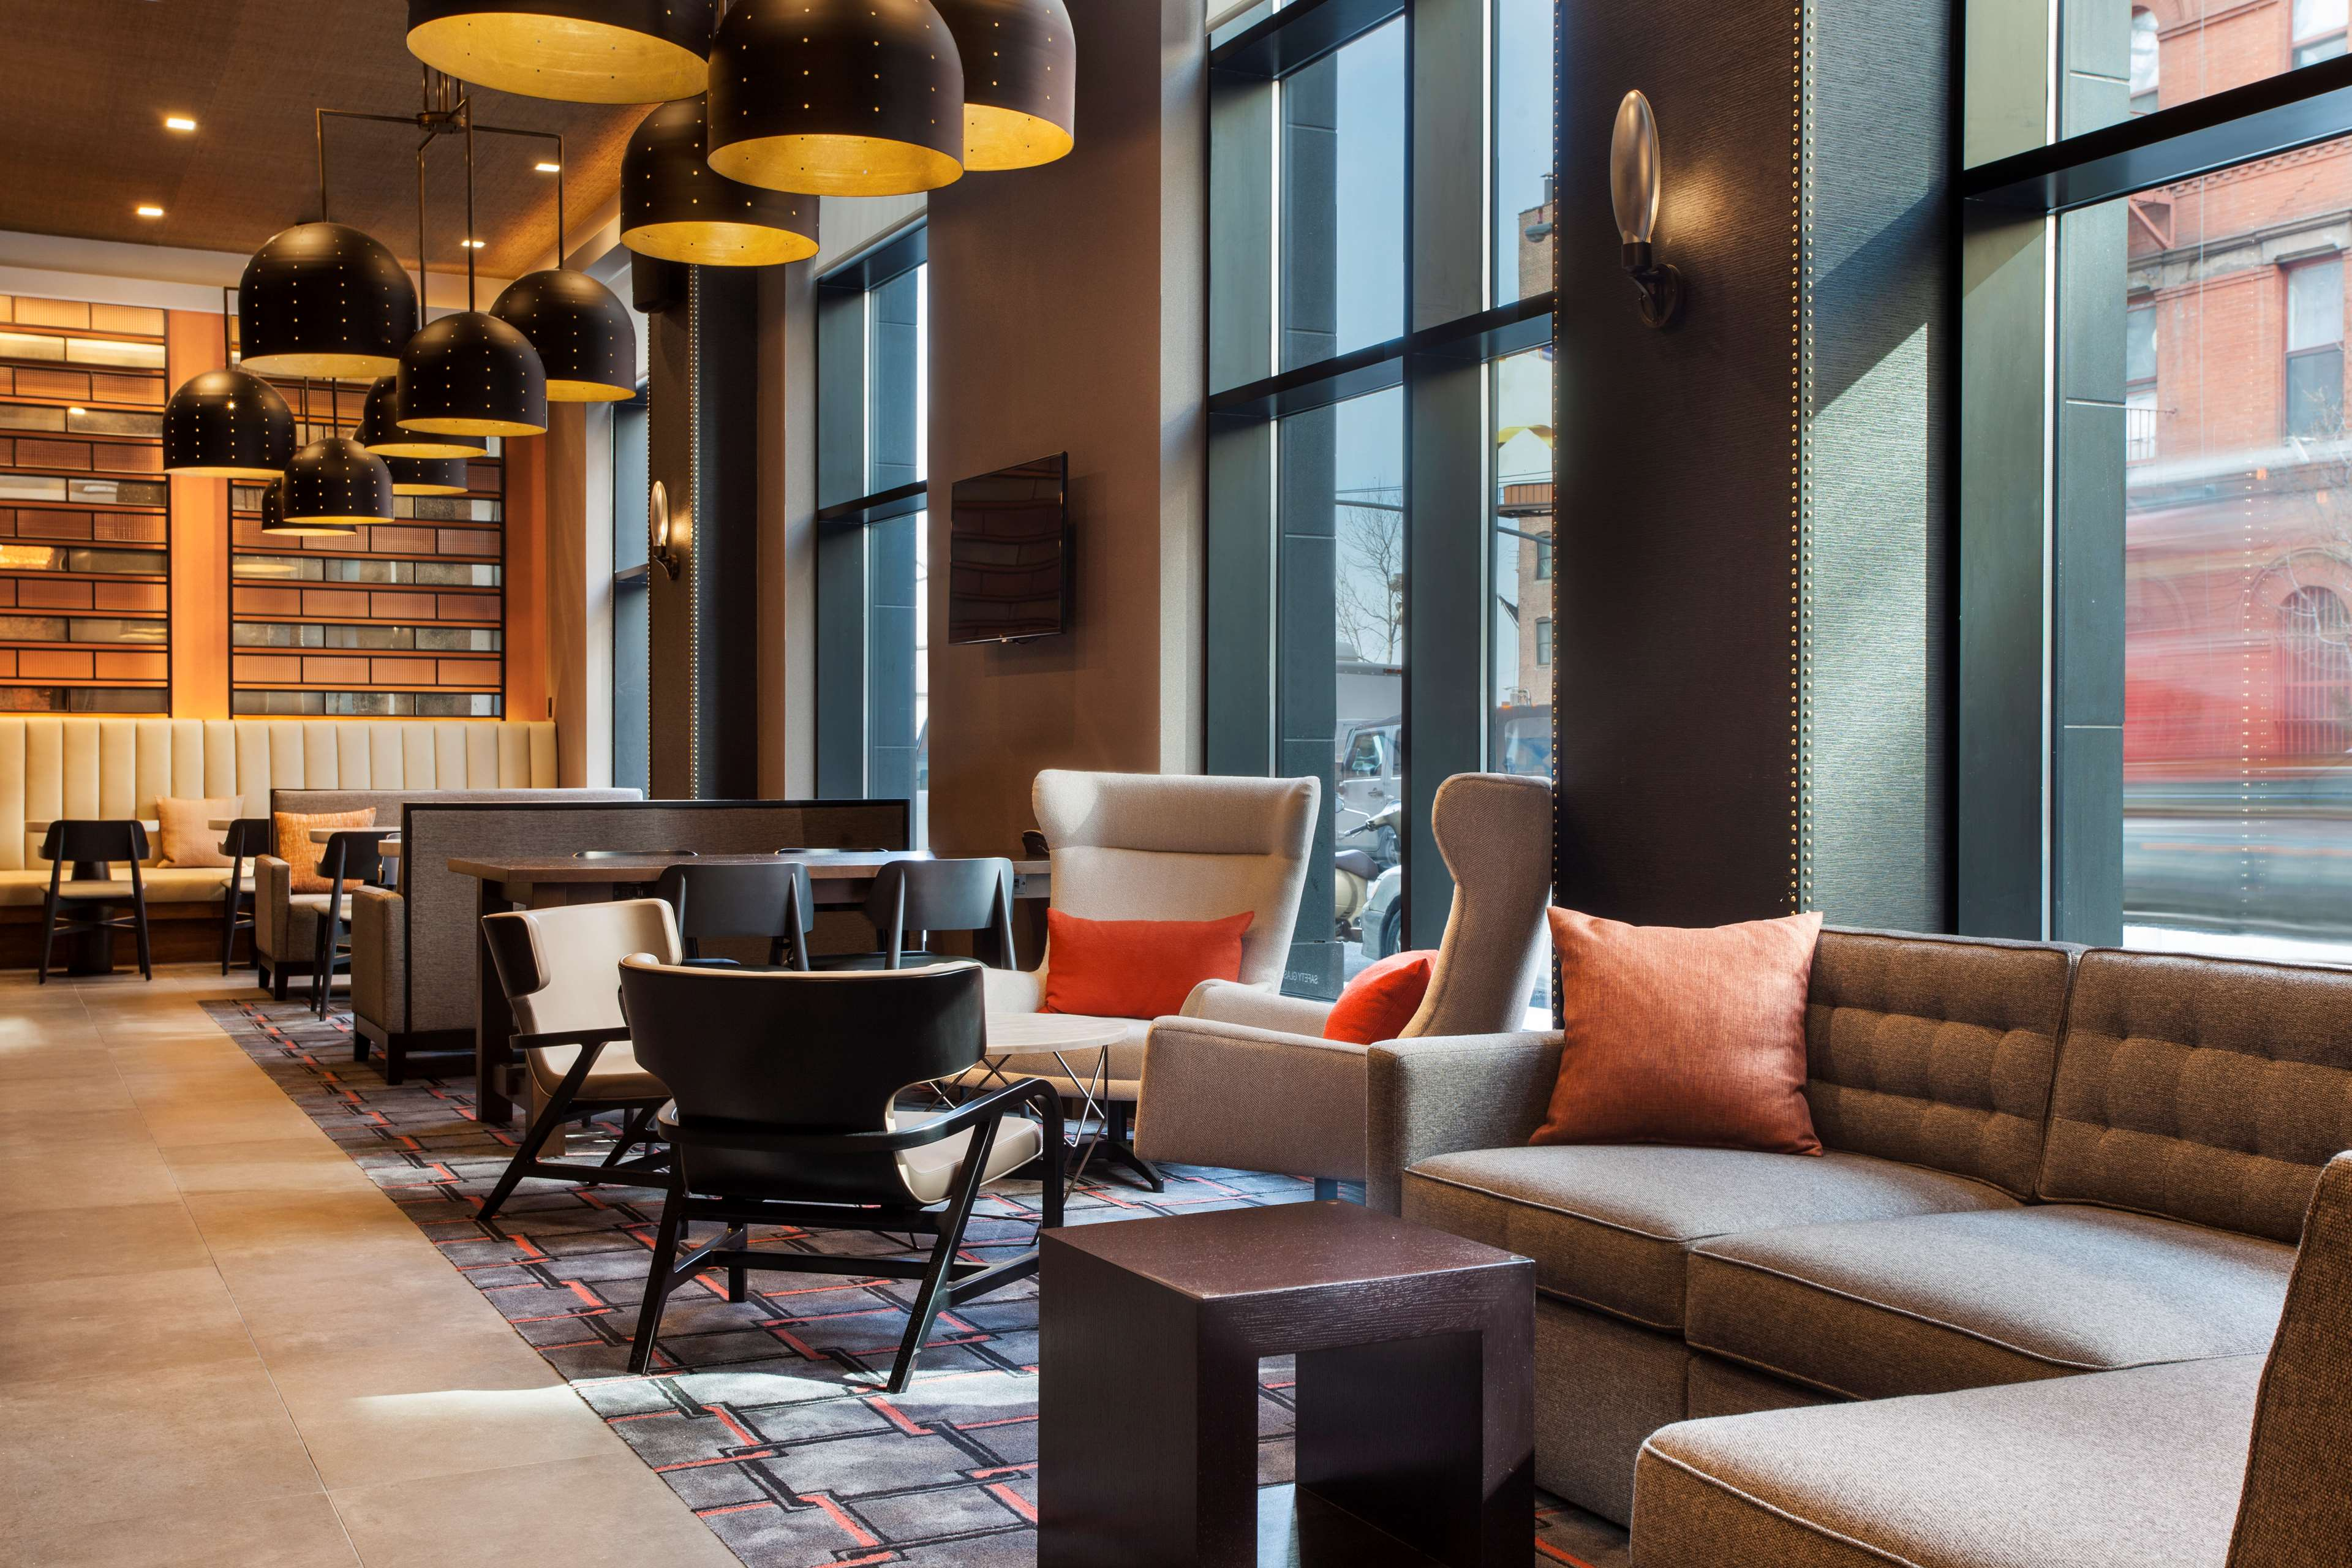 Staybridge Suites Times Square - New York  - TripAdvisor